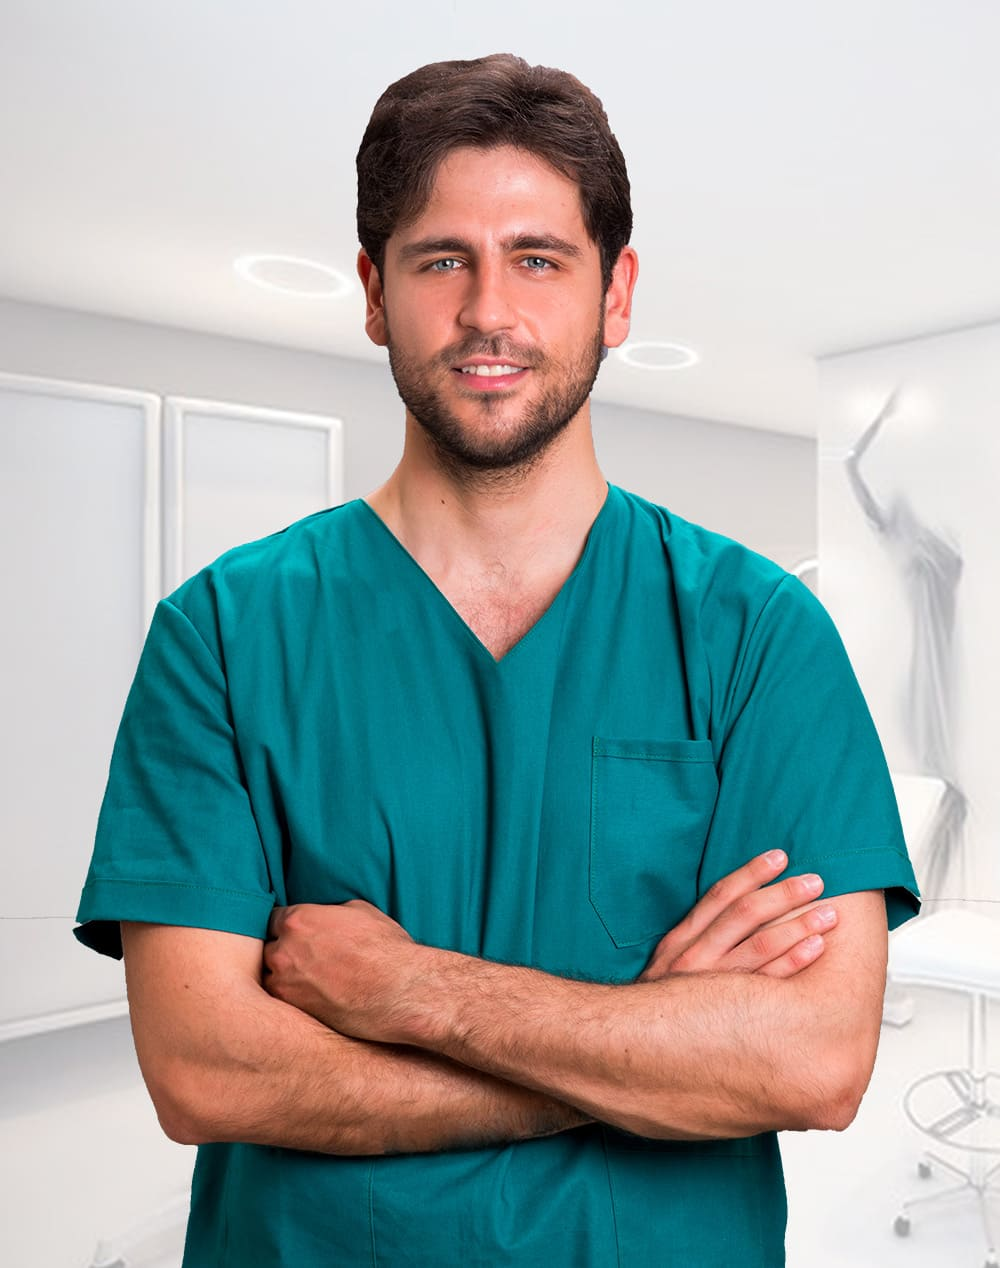 Dott. Davide Fattore Dermatologo Caserta